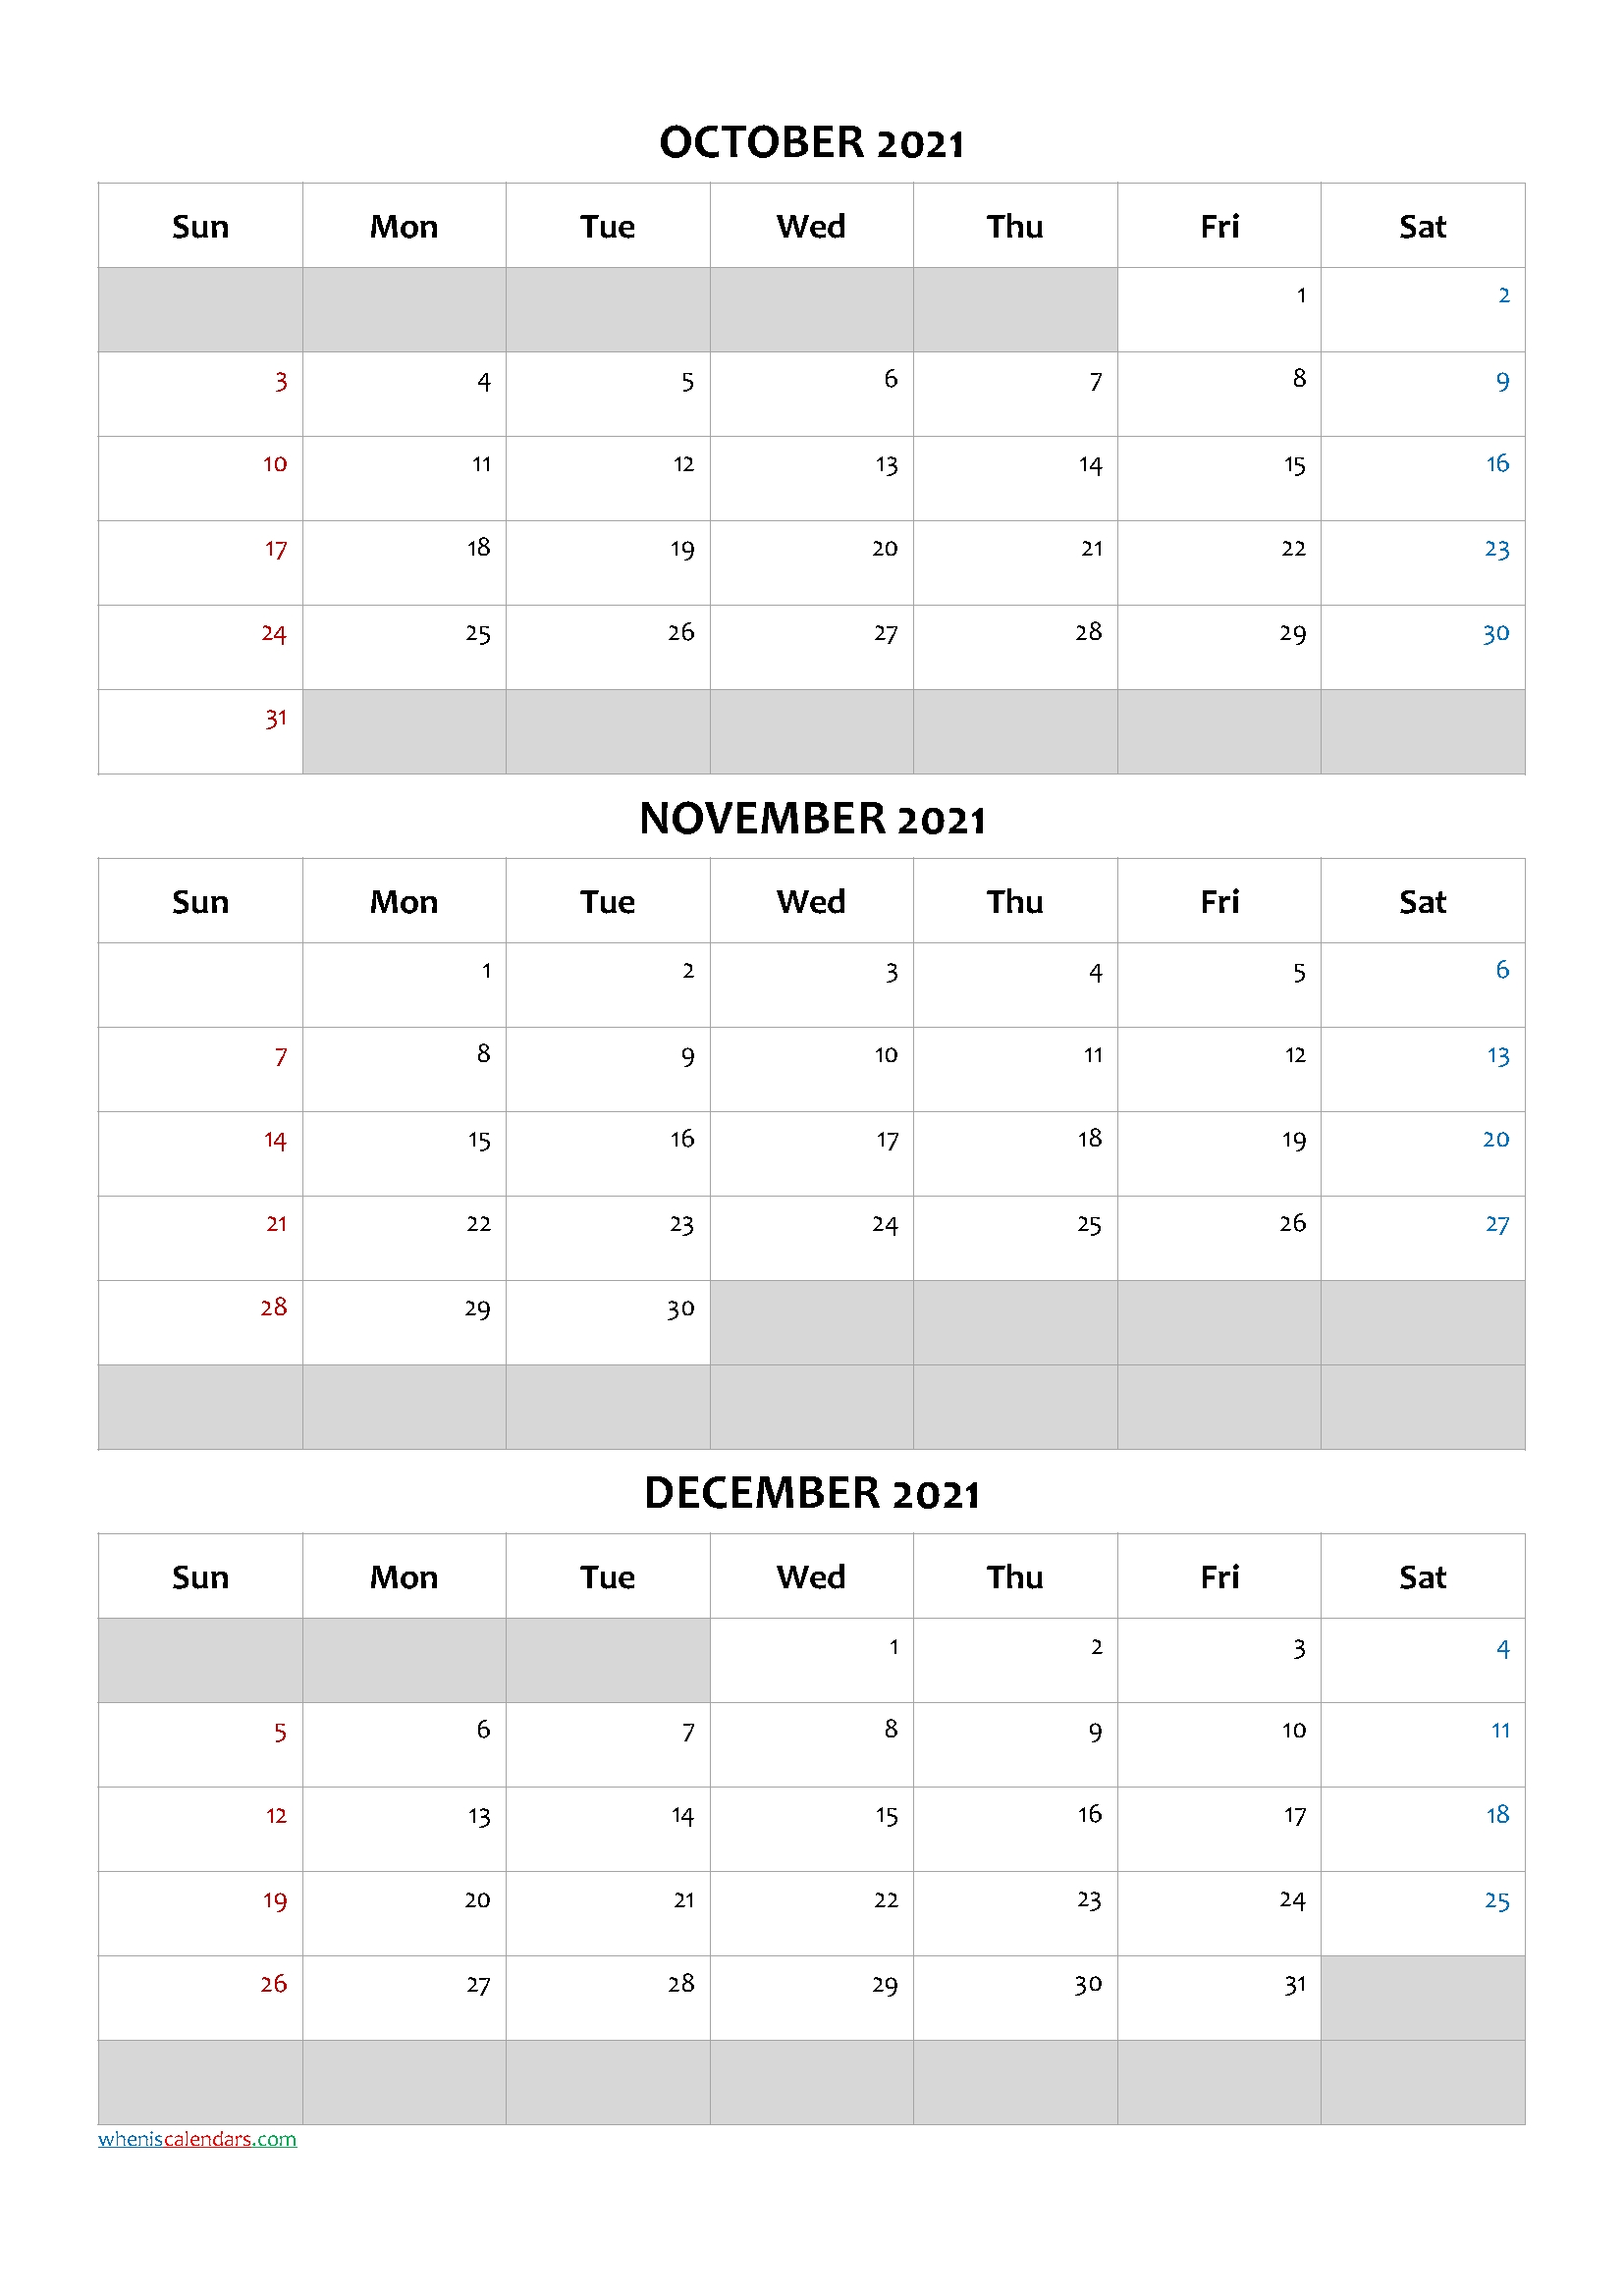 2021 Printable Calendar From October Thru December   Calendar Printables Free Blank January Thru December 2021 Calendar